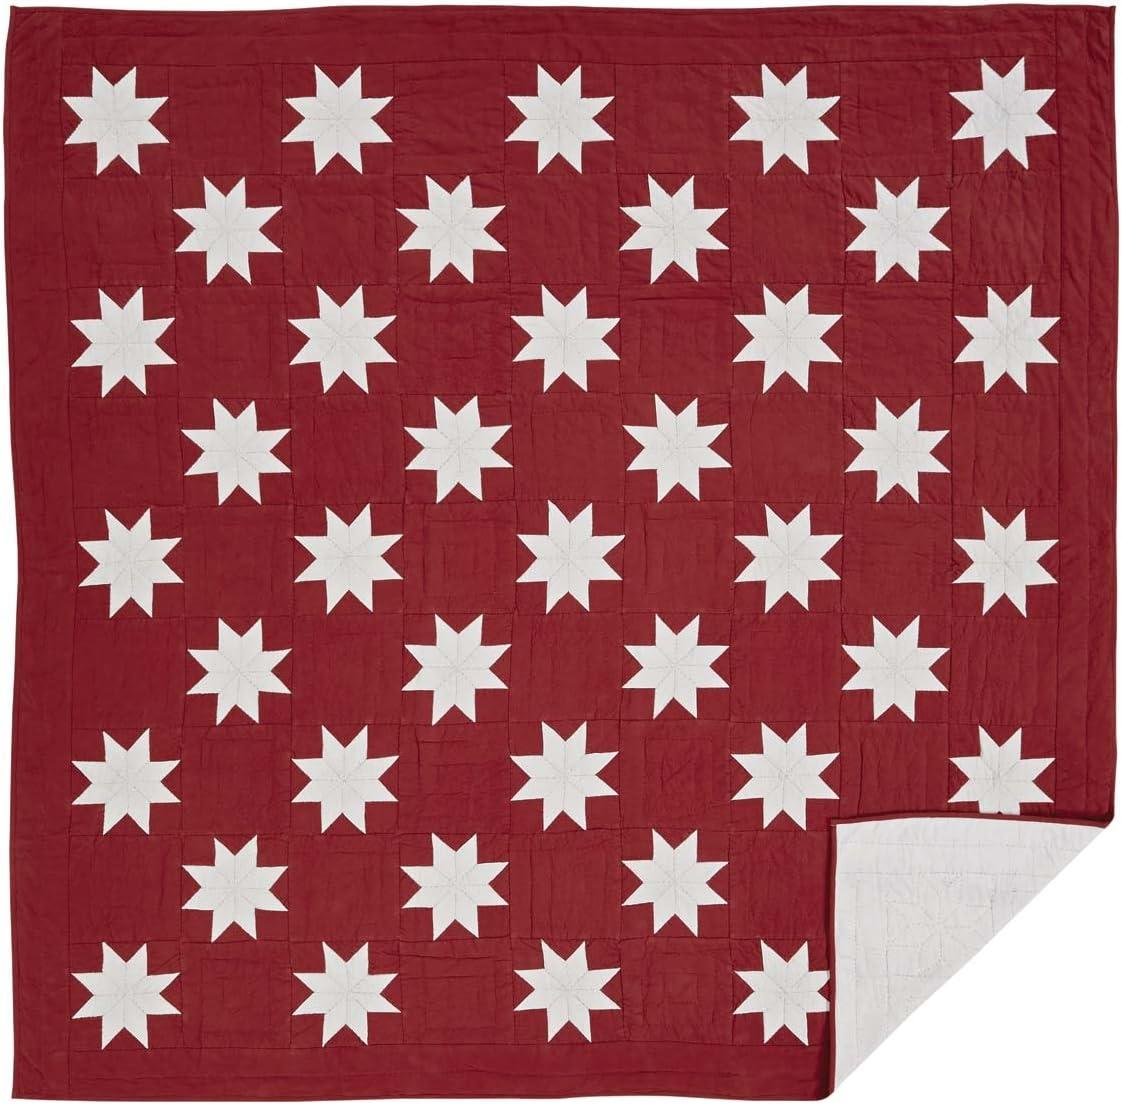 VHC Brands Christmas Farmhouse Bedding - Kent Red Quilt, Queen, Crimson